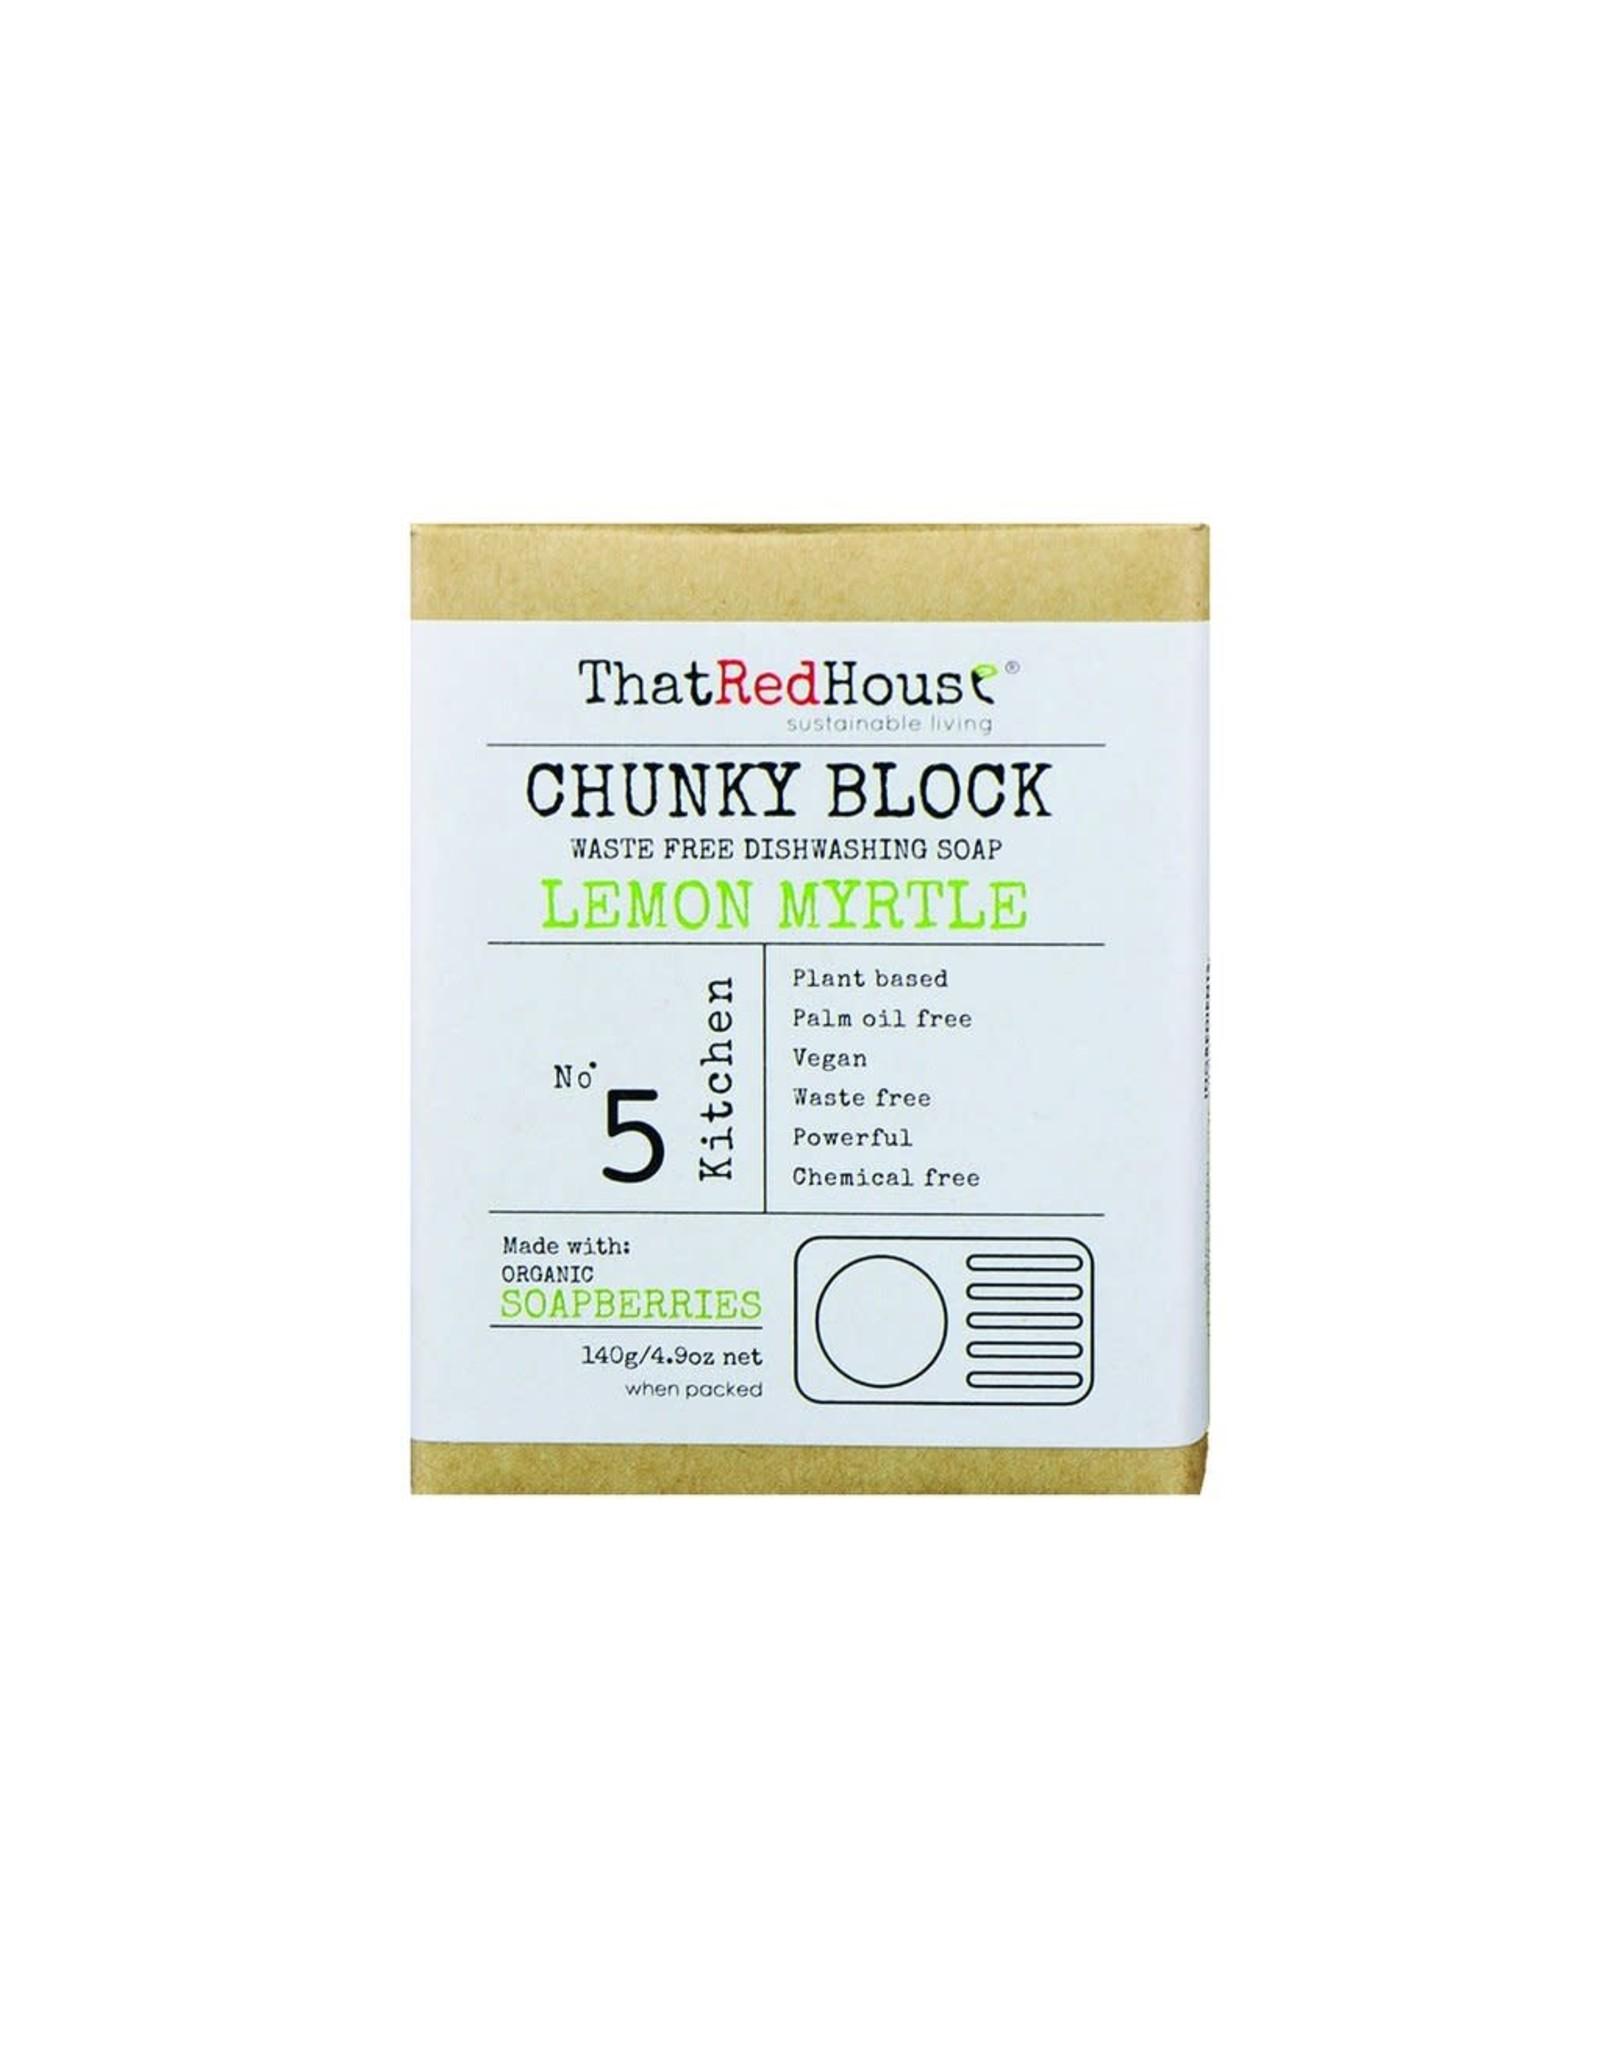 That Red House Chunky Block Dishwashing Soap Lemon Myrtle - 140g